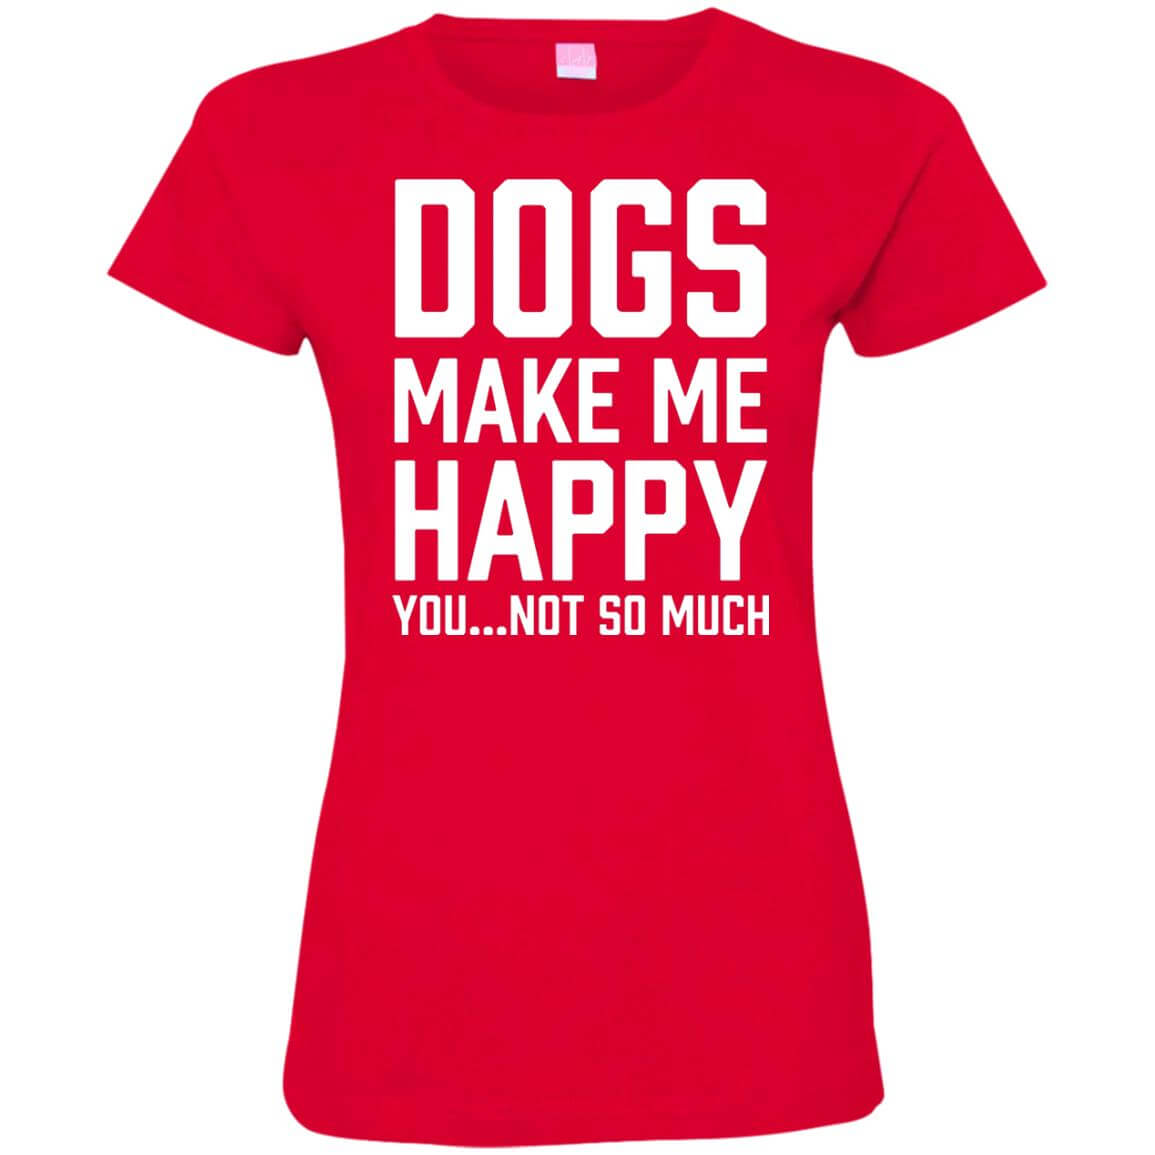 Dogs make me happy ladies premium t shirt for Medical pet shirt dog